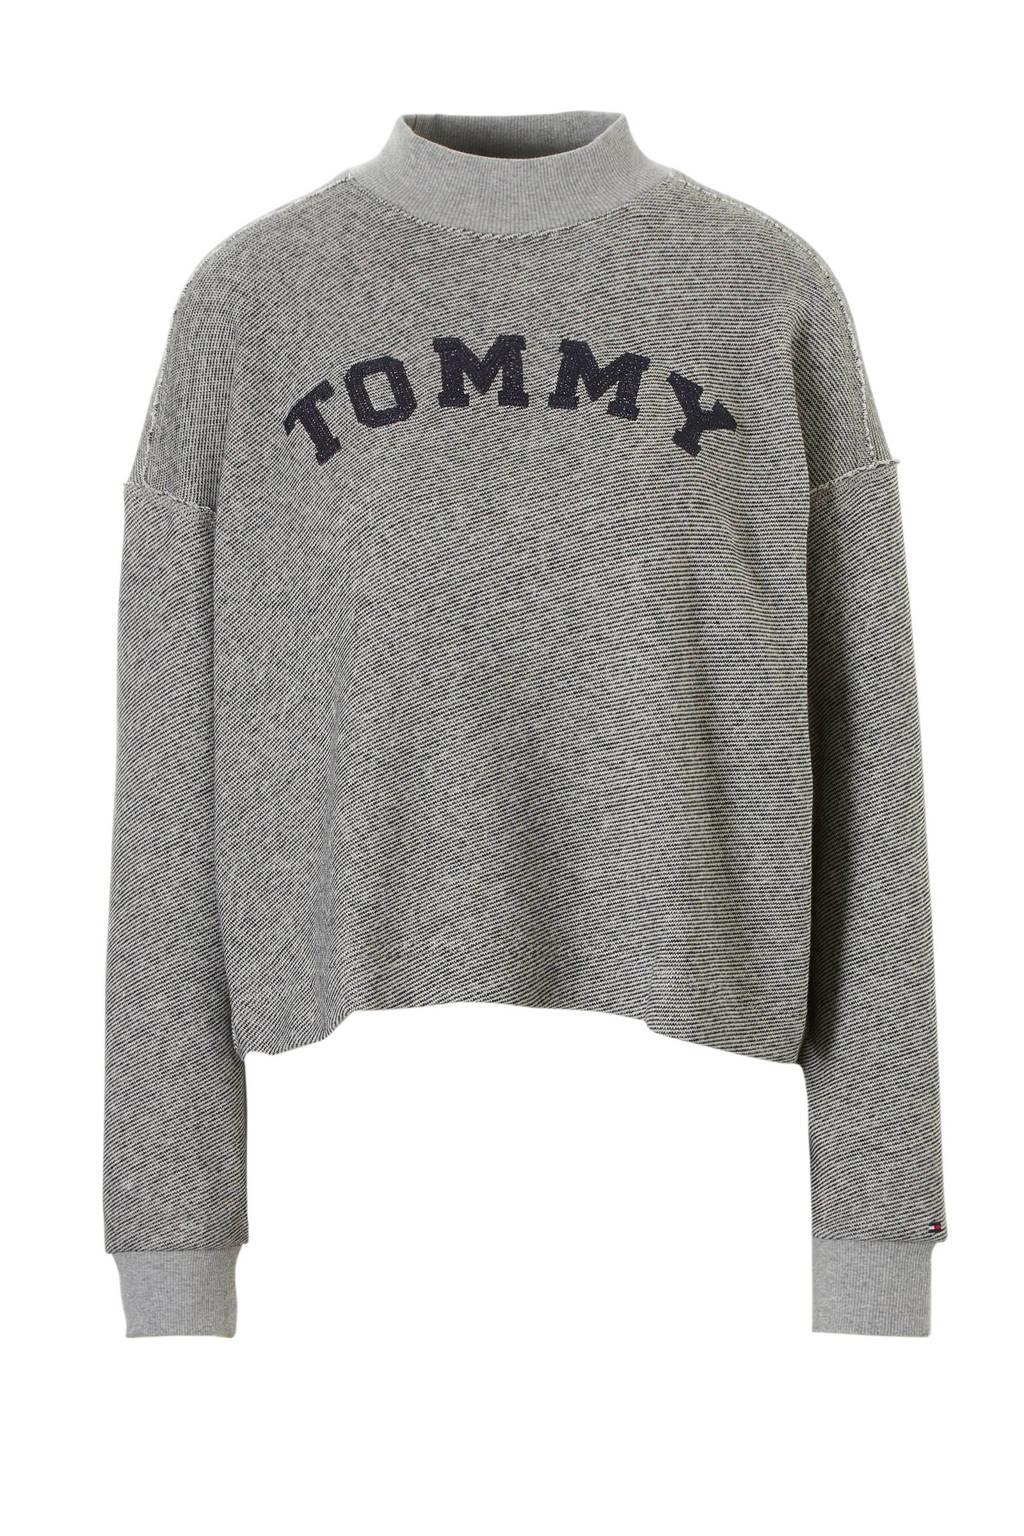 Tommy Hilfiger loungetop grijs, Grijs